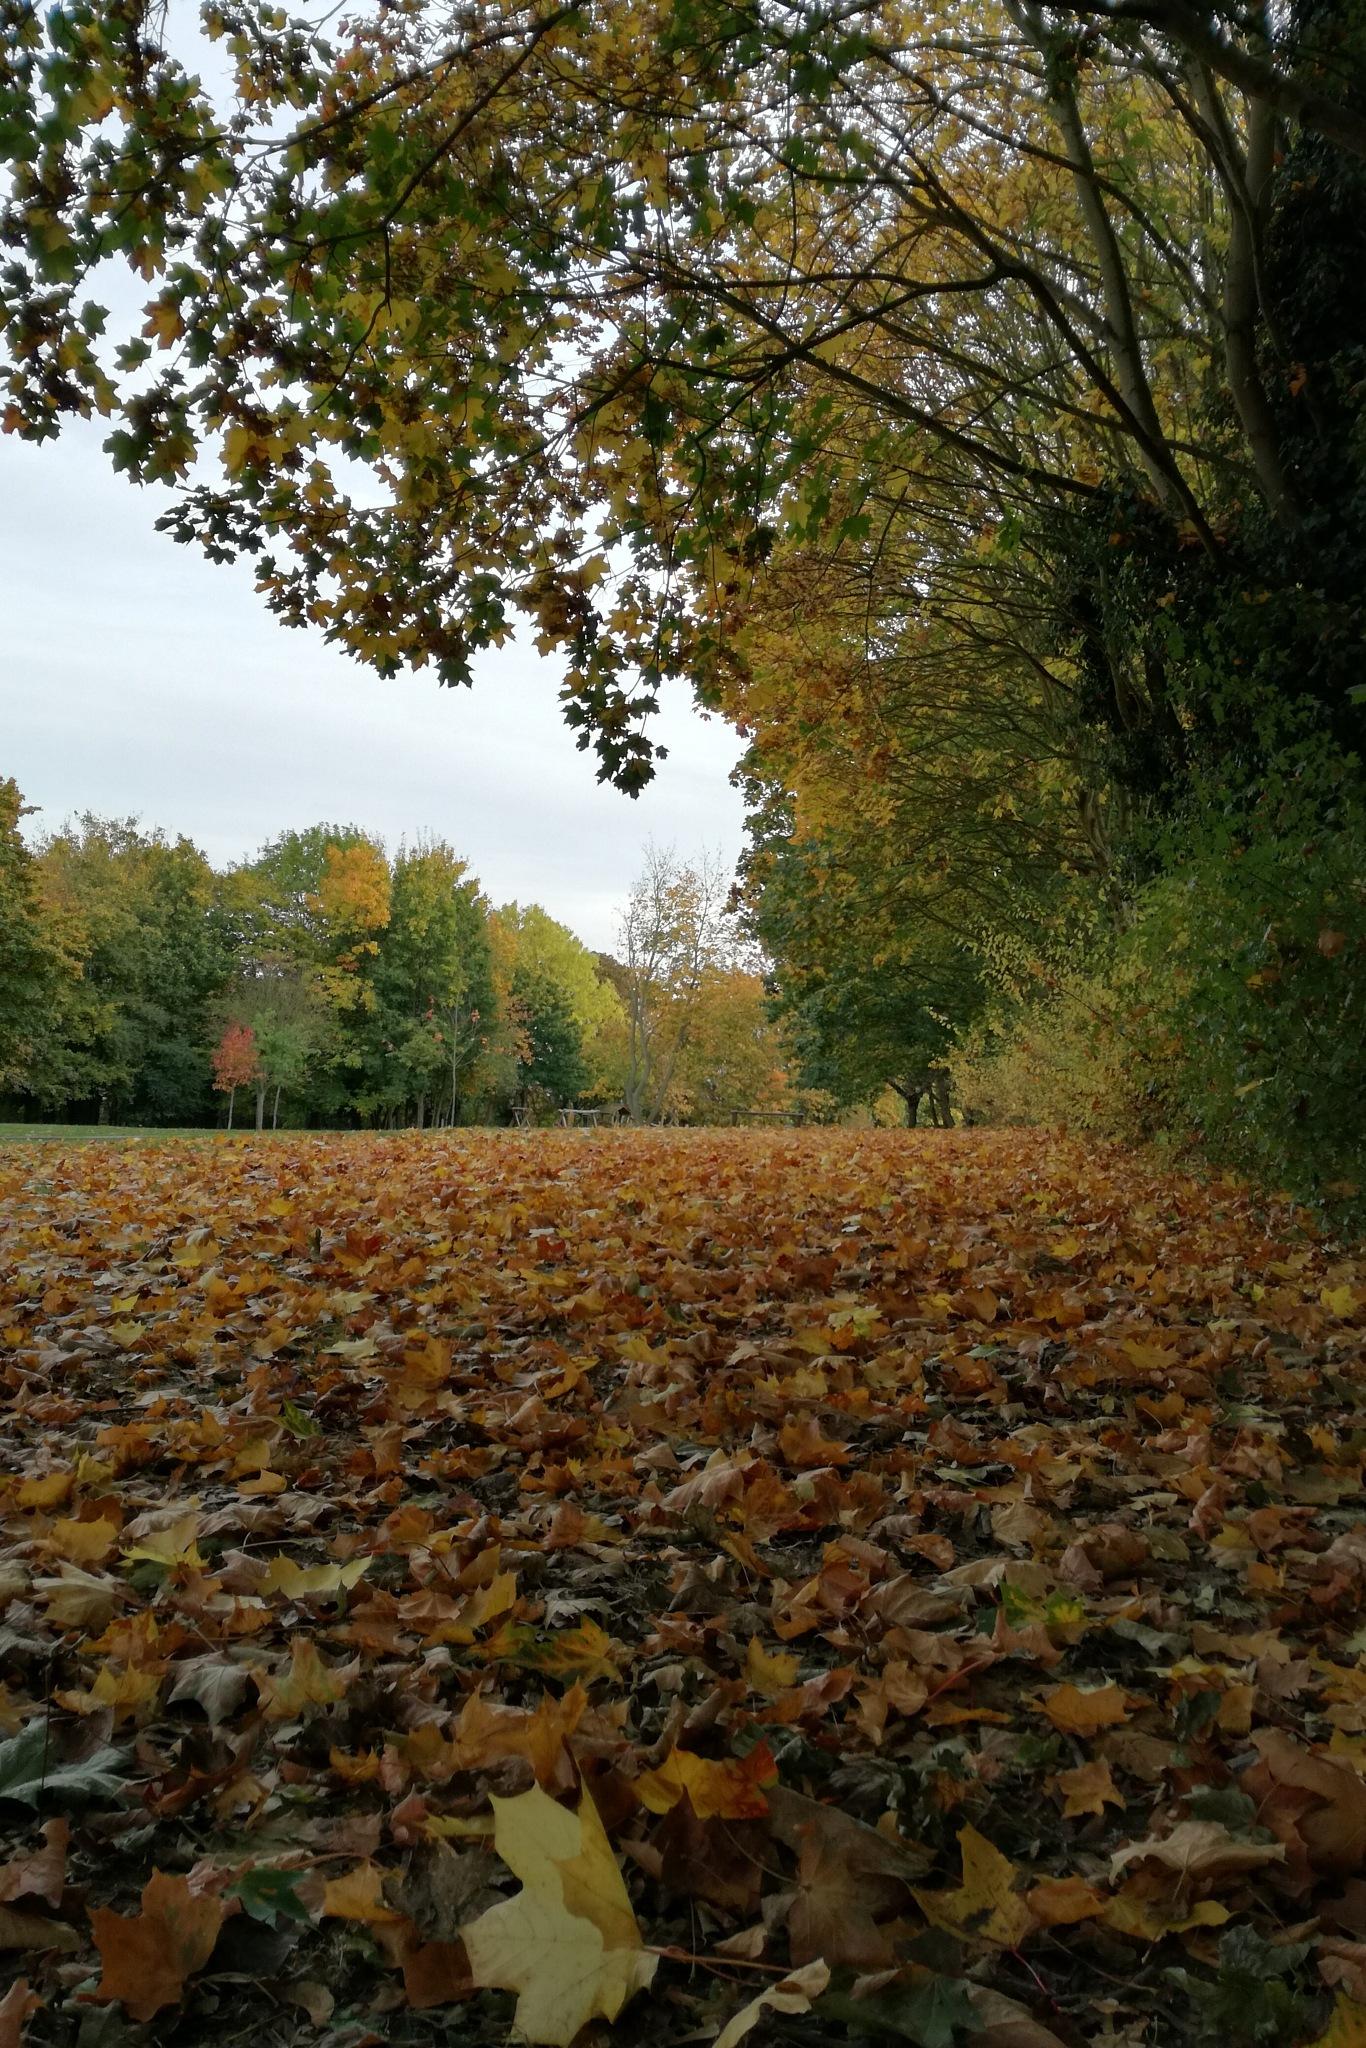 Autumn leaves. by Kirstin Walden Crockford